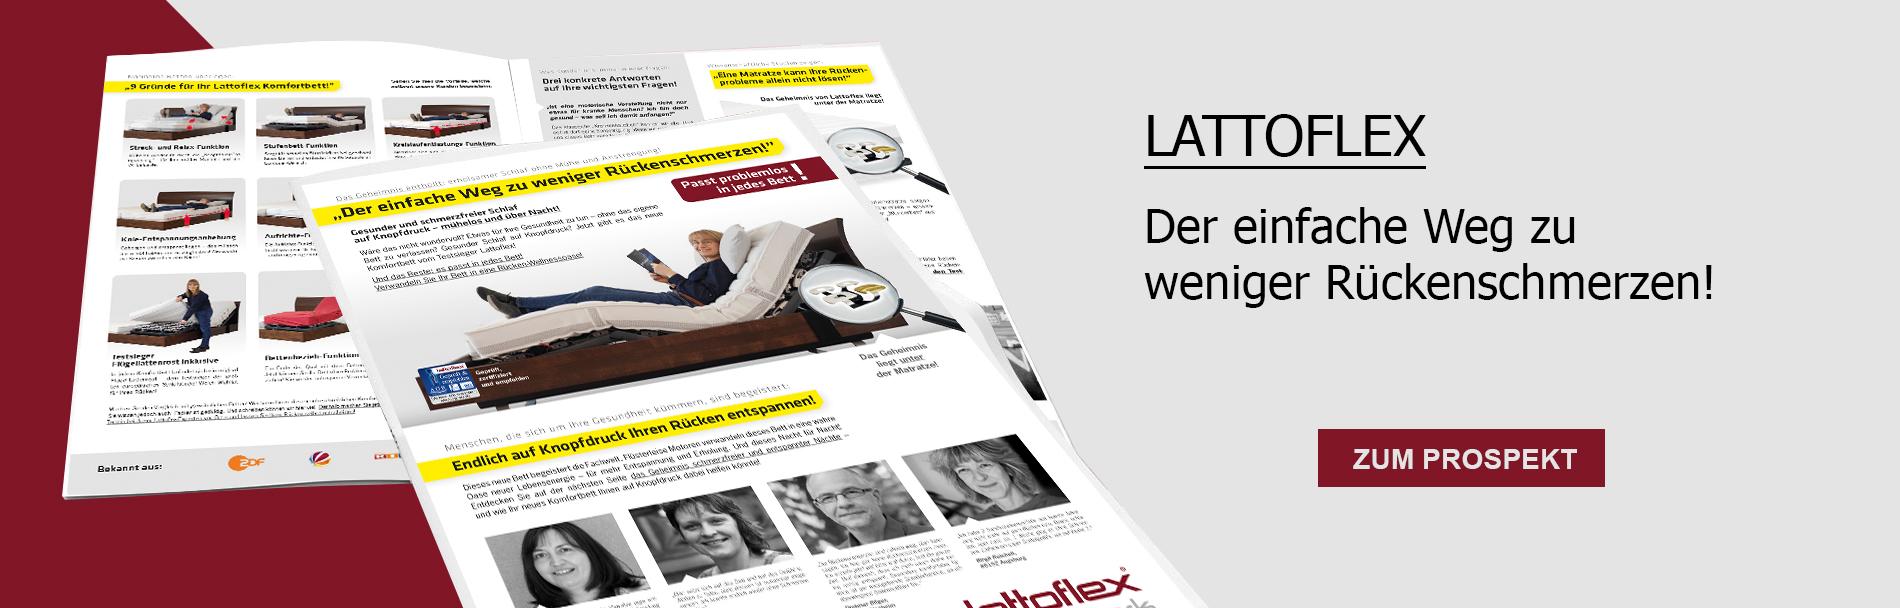 slider-prospekt-lattoflex